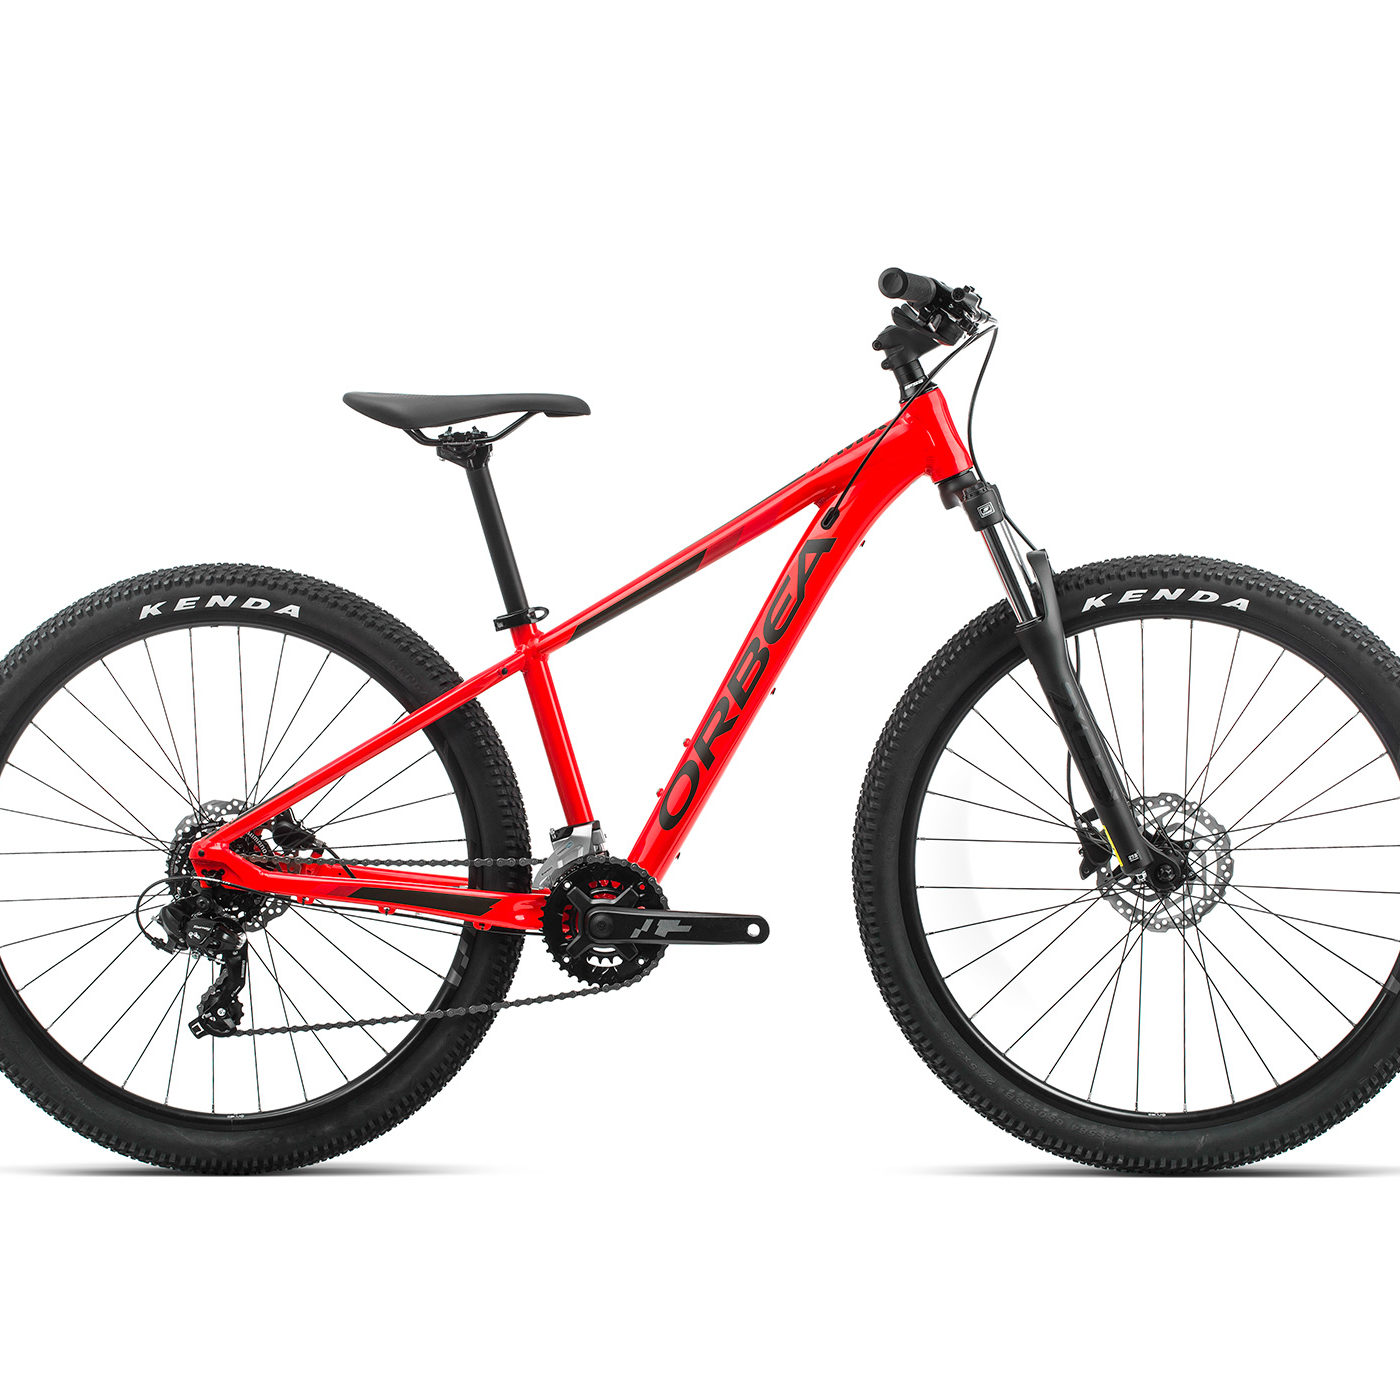 ORBEA MX 27 XS XC - BRIGHT RED ZWART (GLOSS)